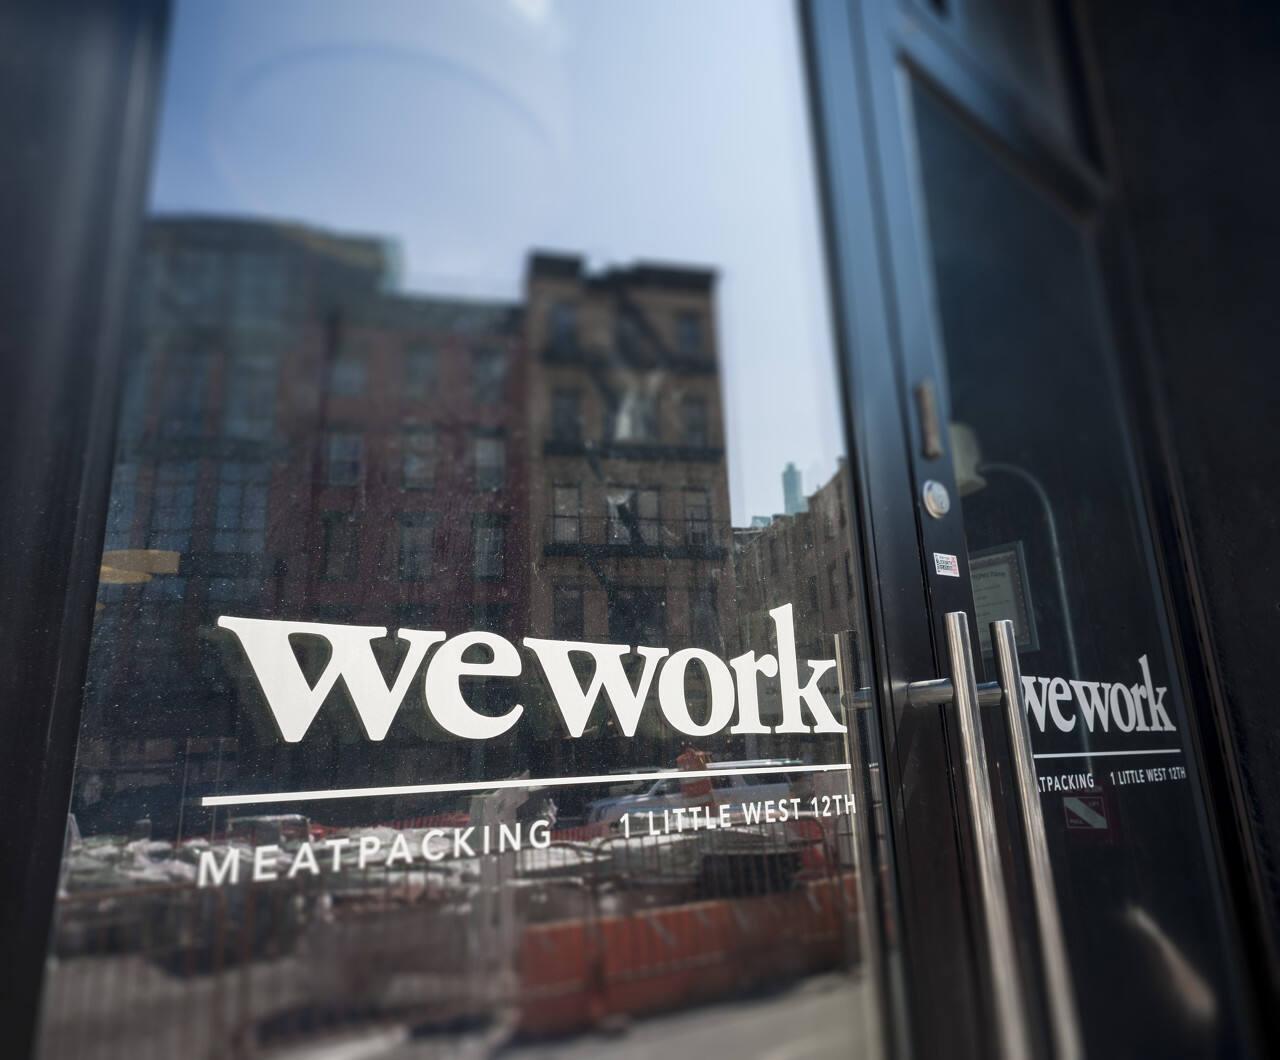 WeWork中国获2亿美金注血,老股东挚信资本为何亲自下场?